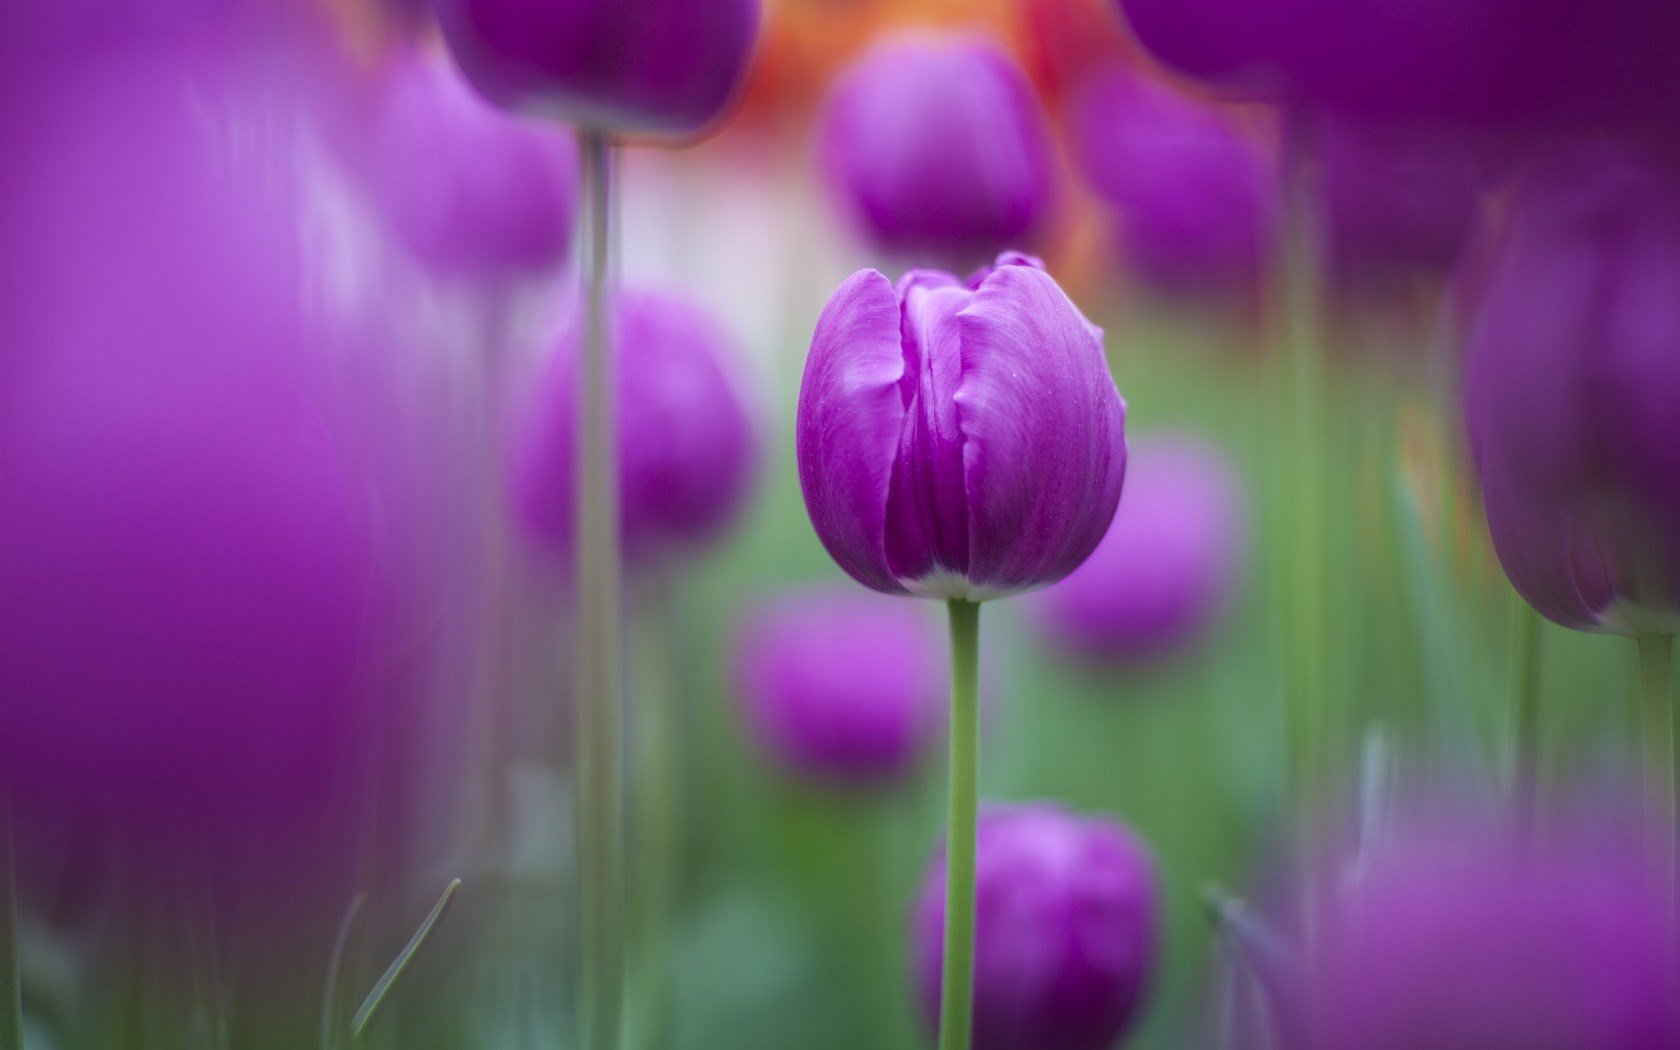 Tulips Purple Focus Flowers Nature